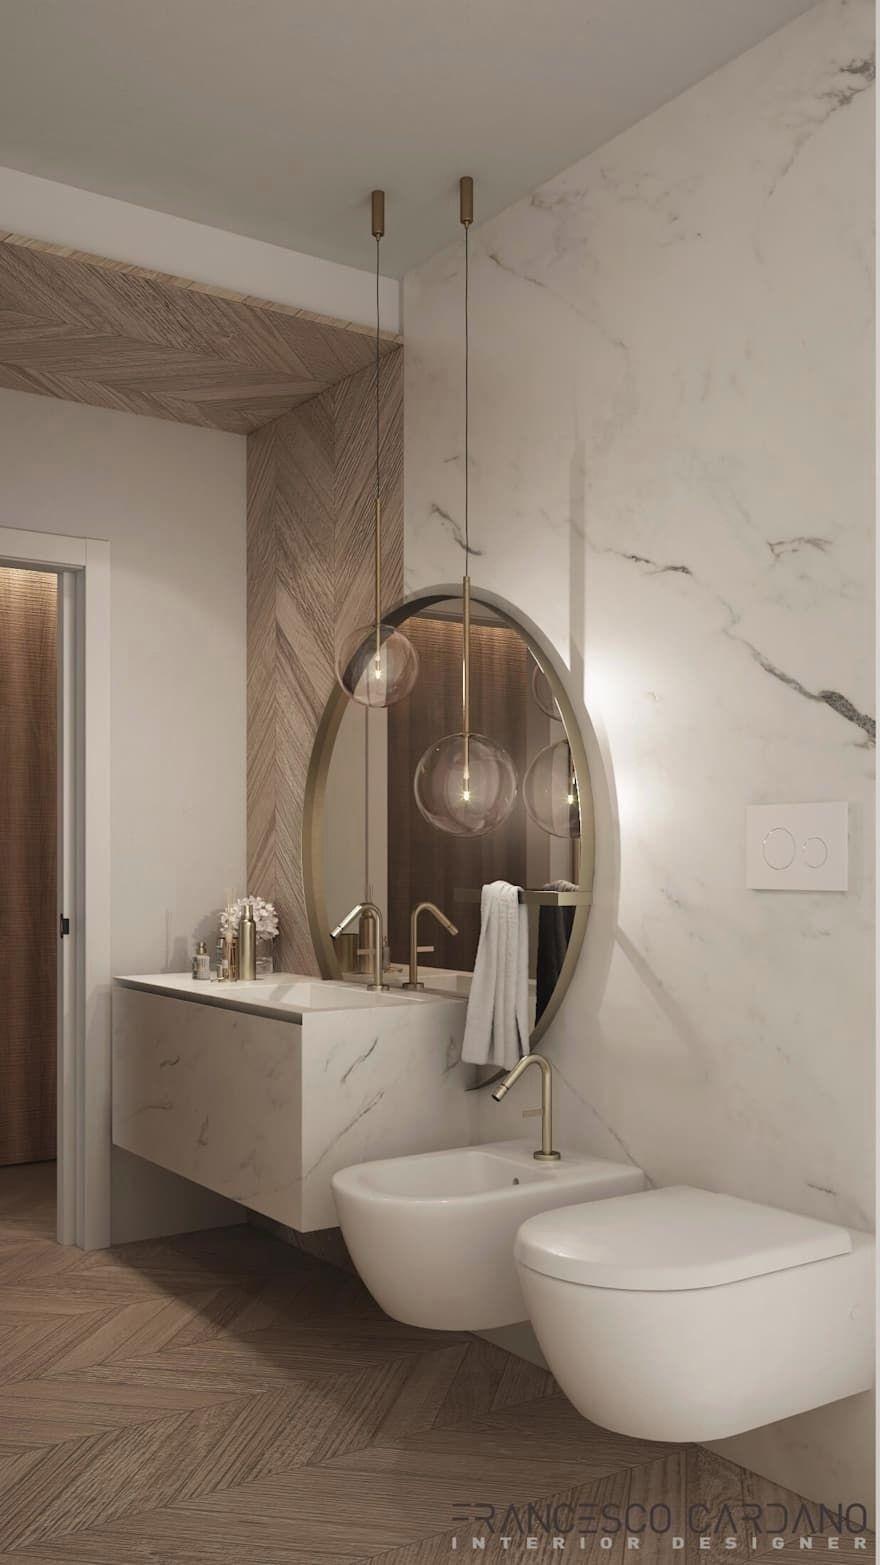 Idee Arredamento Casa Interior Design Homify In 2020 Bathroom Interior Bathroom Interior Design Modern Bathroom Design